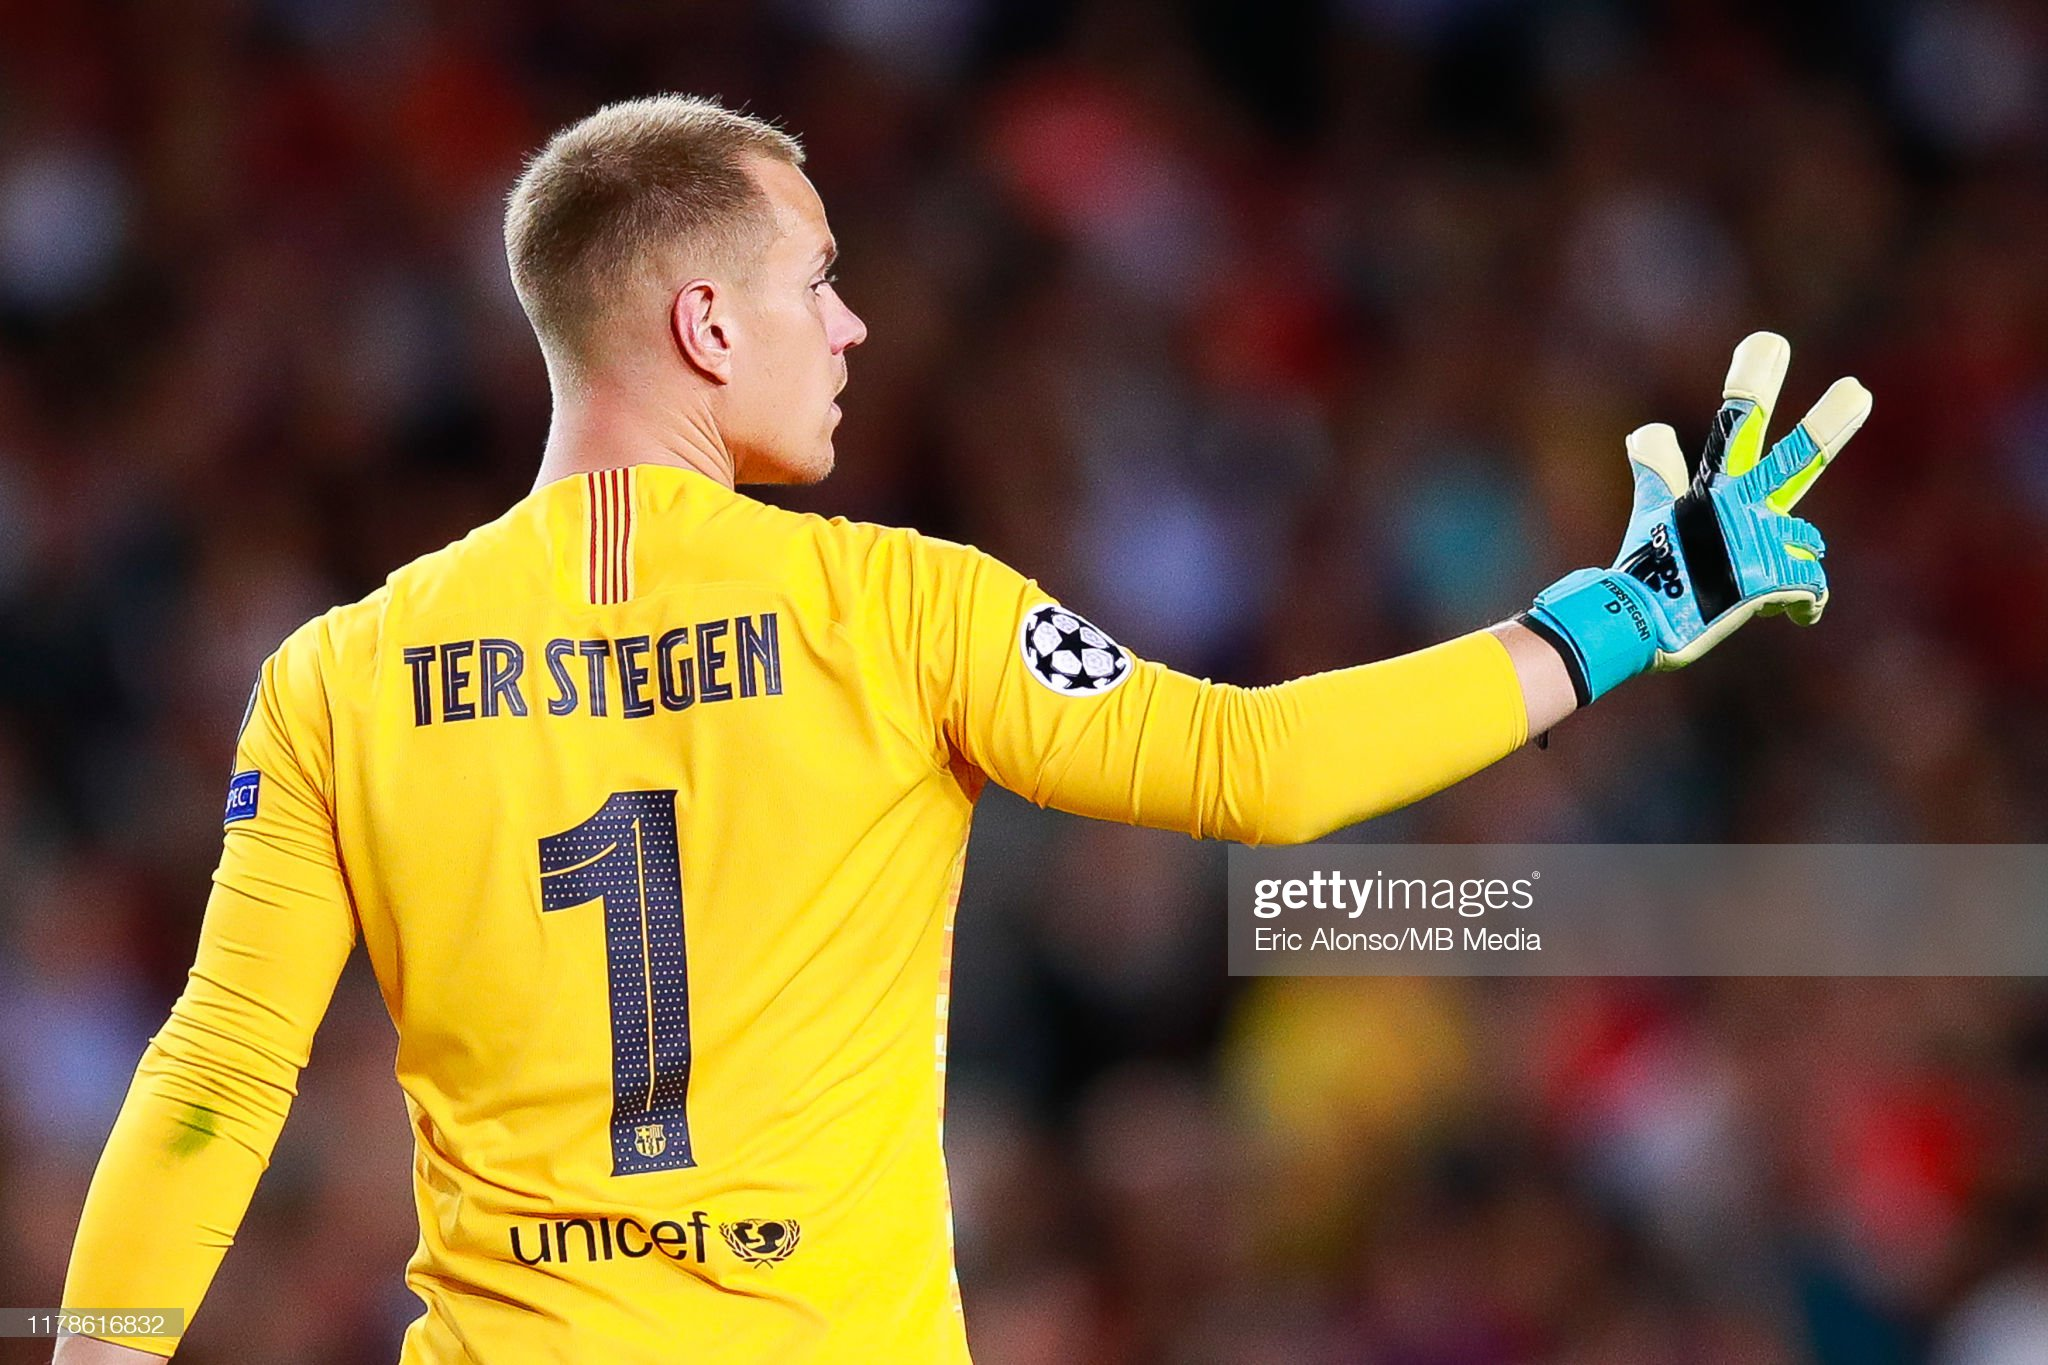 صور مباراة : برشلونة - إنتر 2-1 ( 02-10-2019 )  Marc-andre-ter-stegen-of-fc-barcelona-follows-the-action-during-the-picture-id1178616832?s=2048x2048